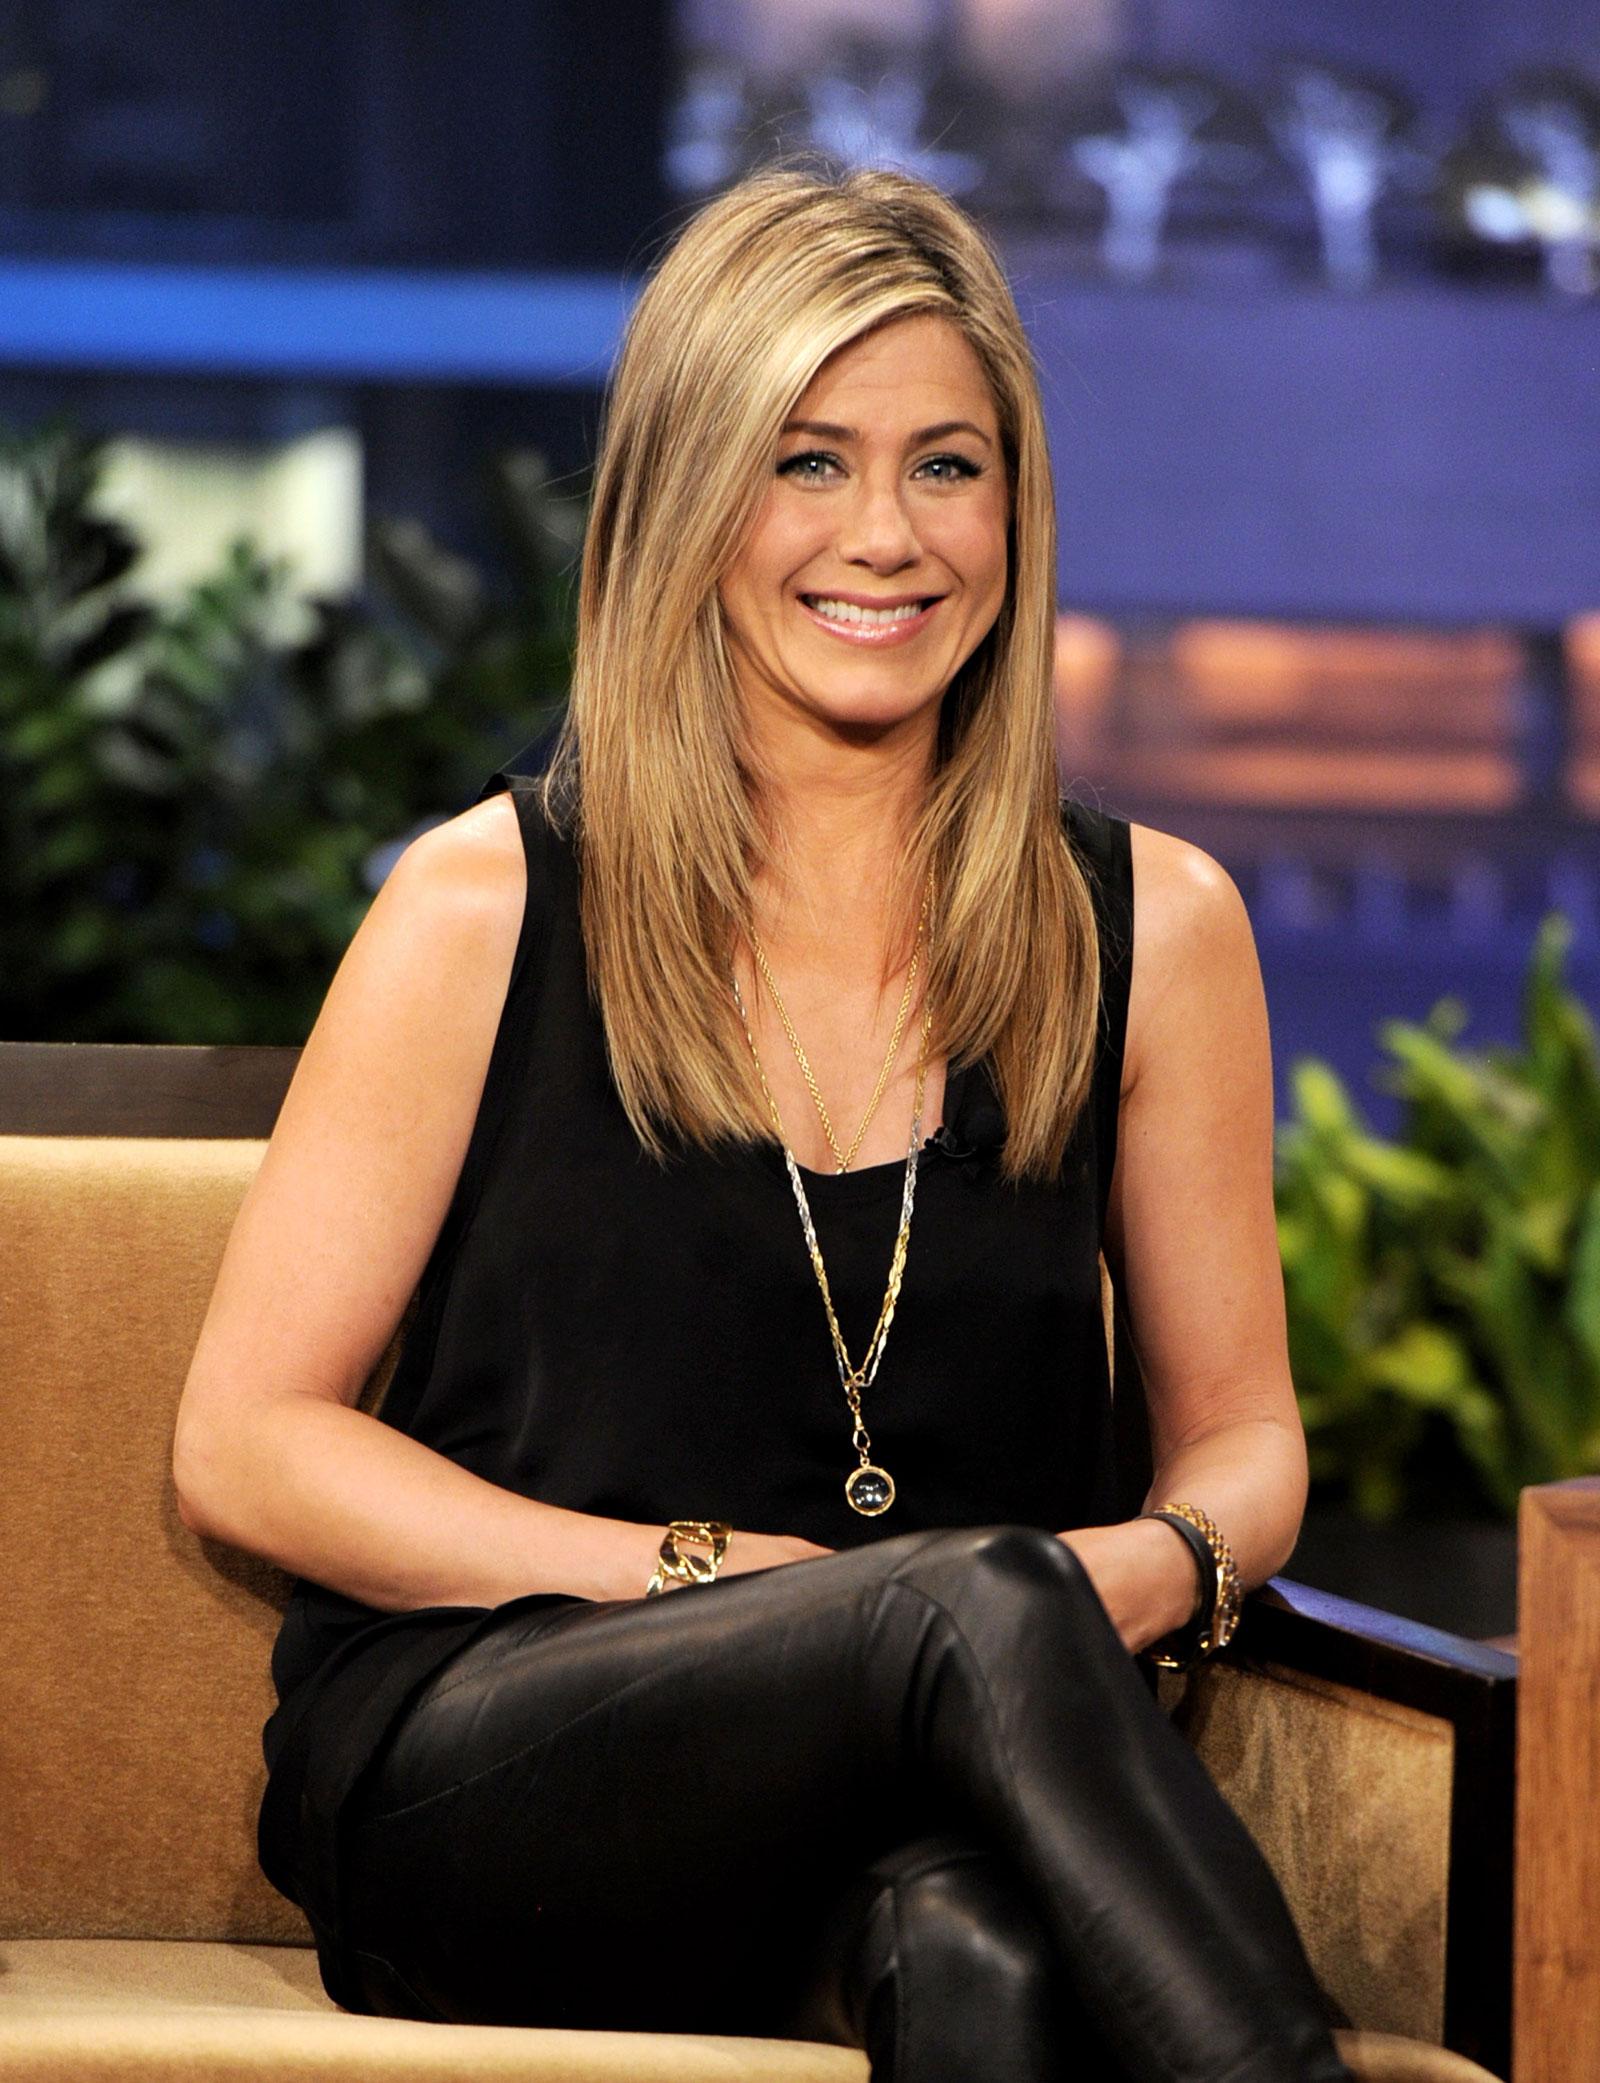 Jennifer Aniston At The Tonight Show With Jay Leno